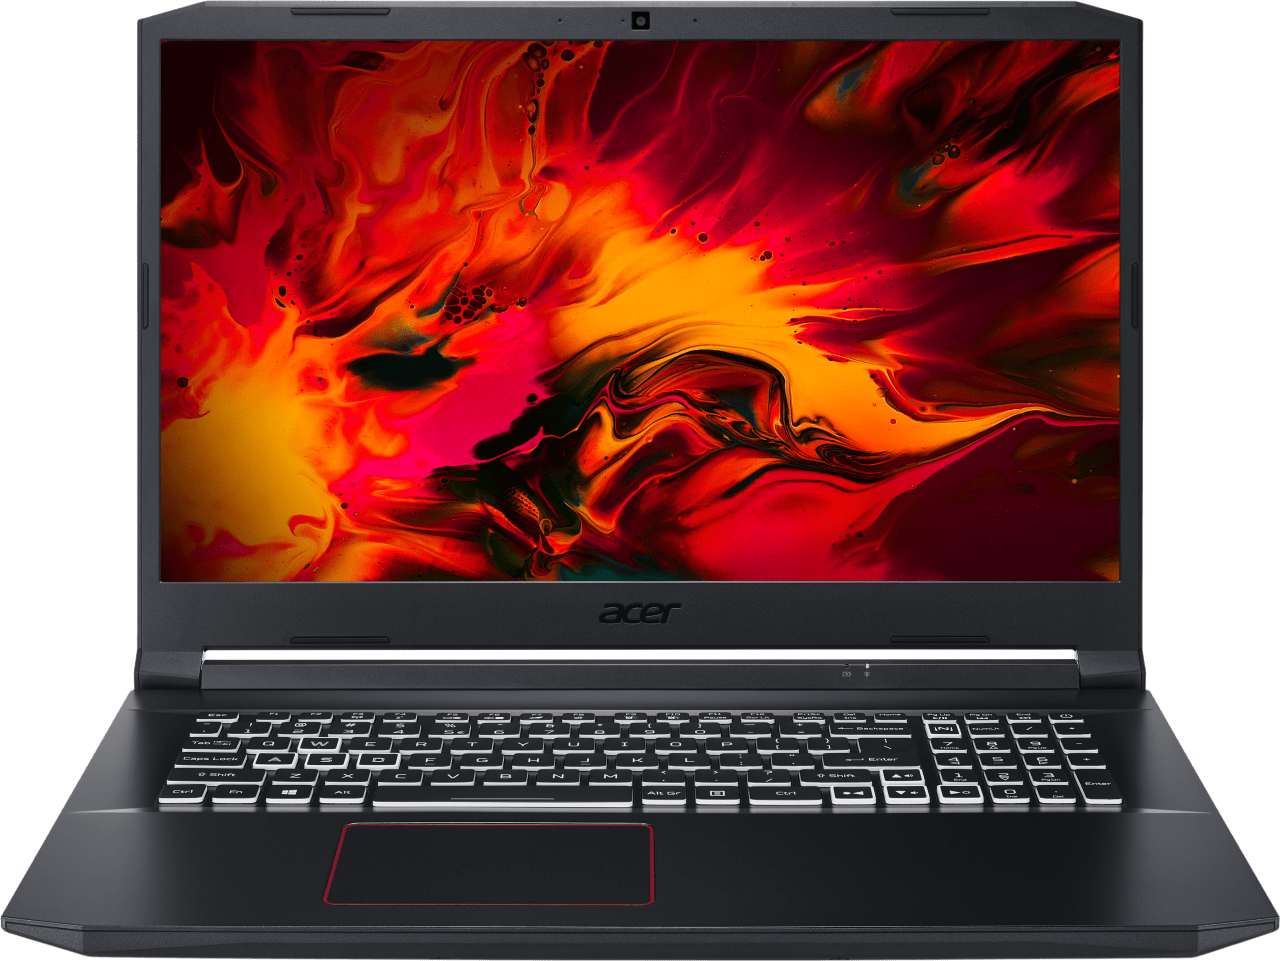 Black Acer Nitro 5 - Gaming Laptop - Intel® Core™ i7-10750H - 16GB - 512GB SSD - NVIDIA® GeForce® RTX 3060 (6GB).1